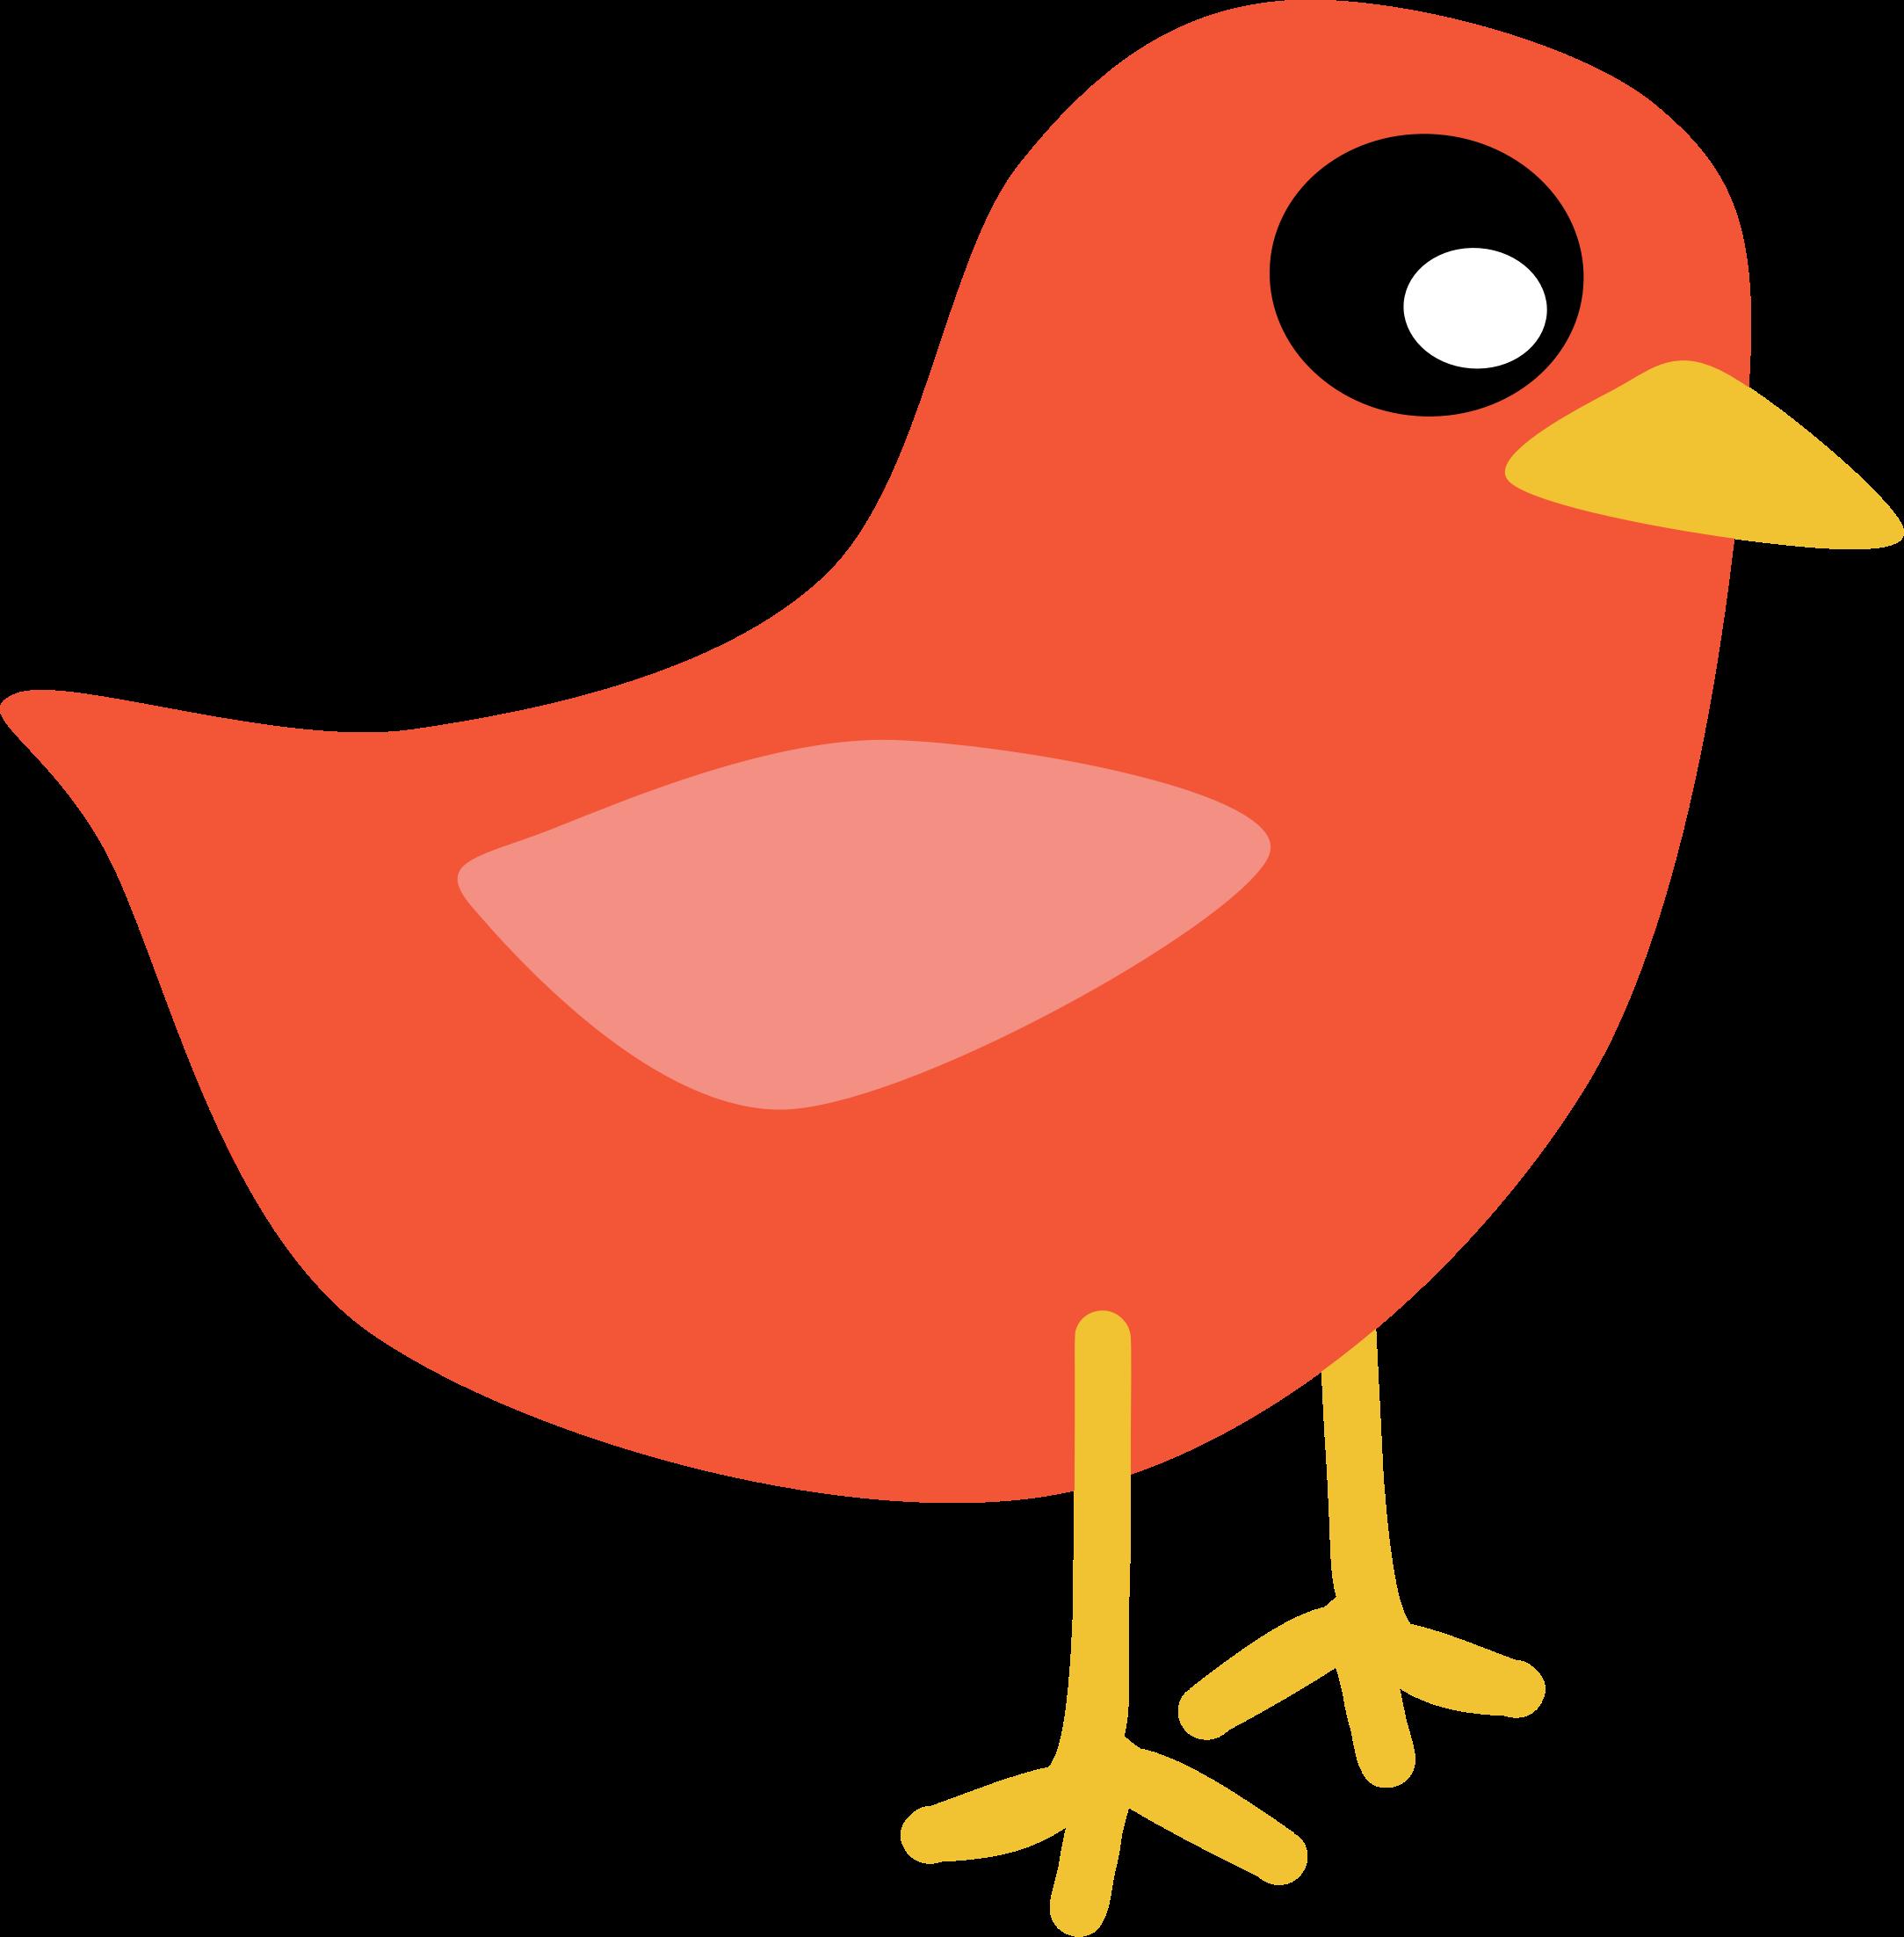 Red Bird Clipart - Clipart Kid